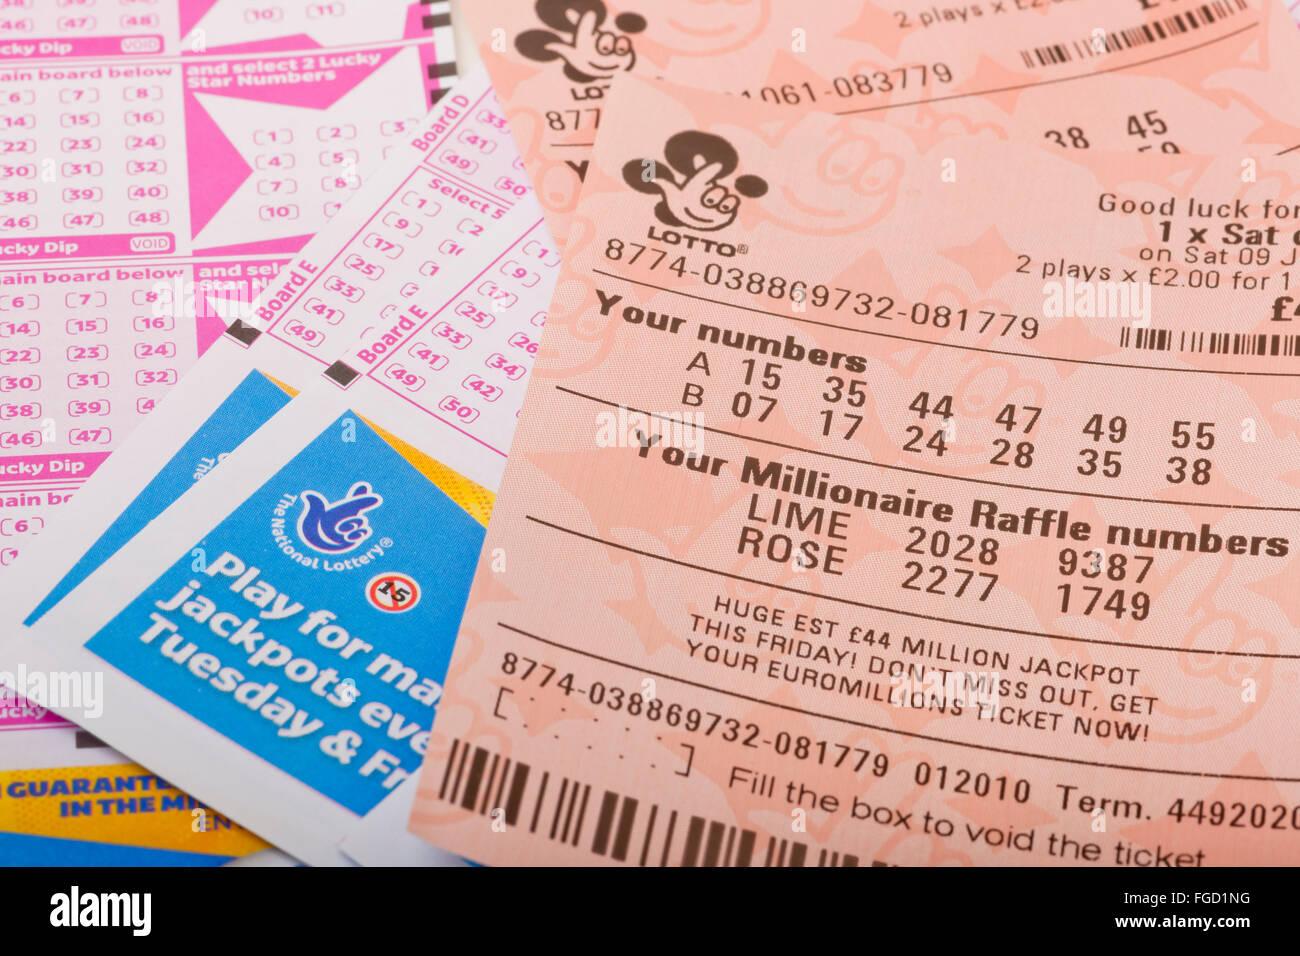 Lotto England